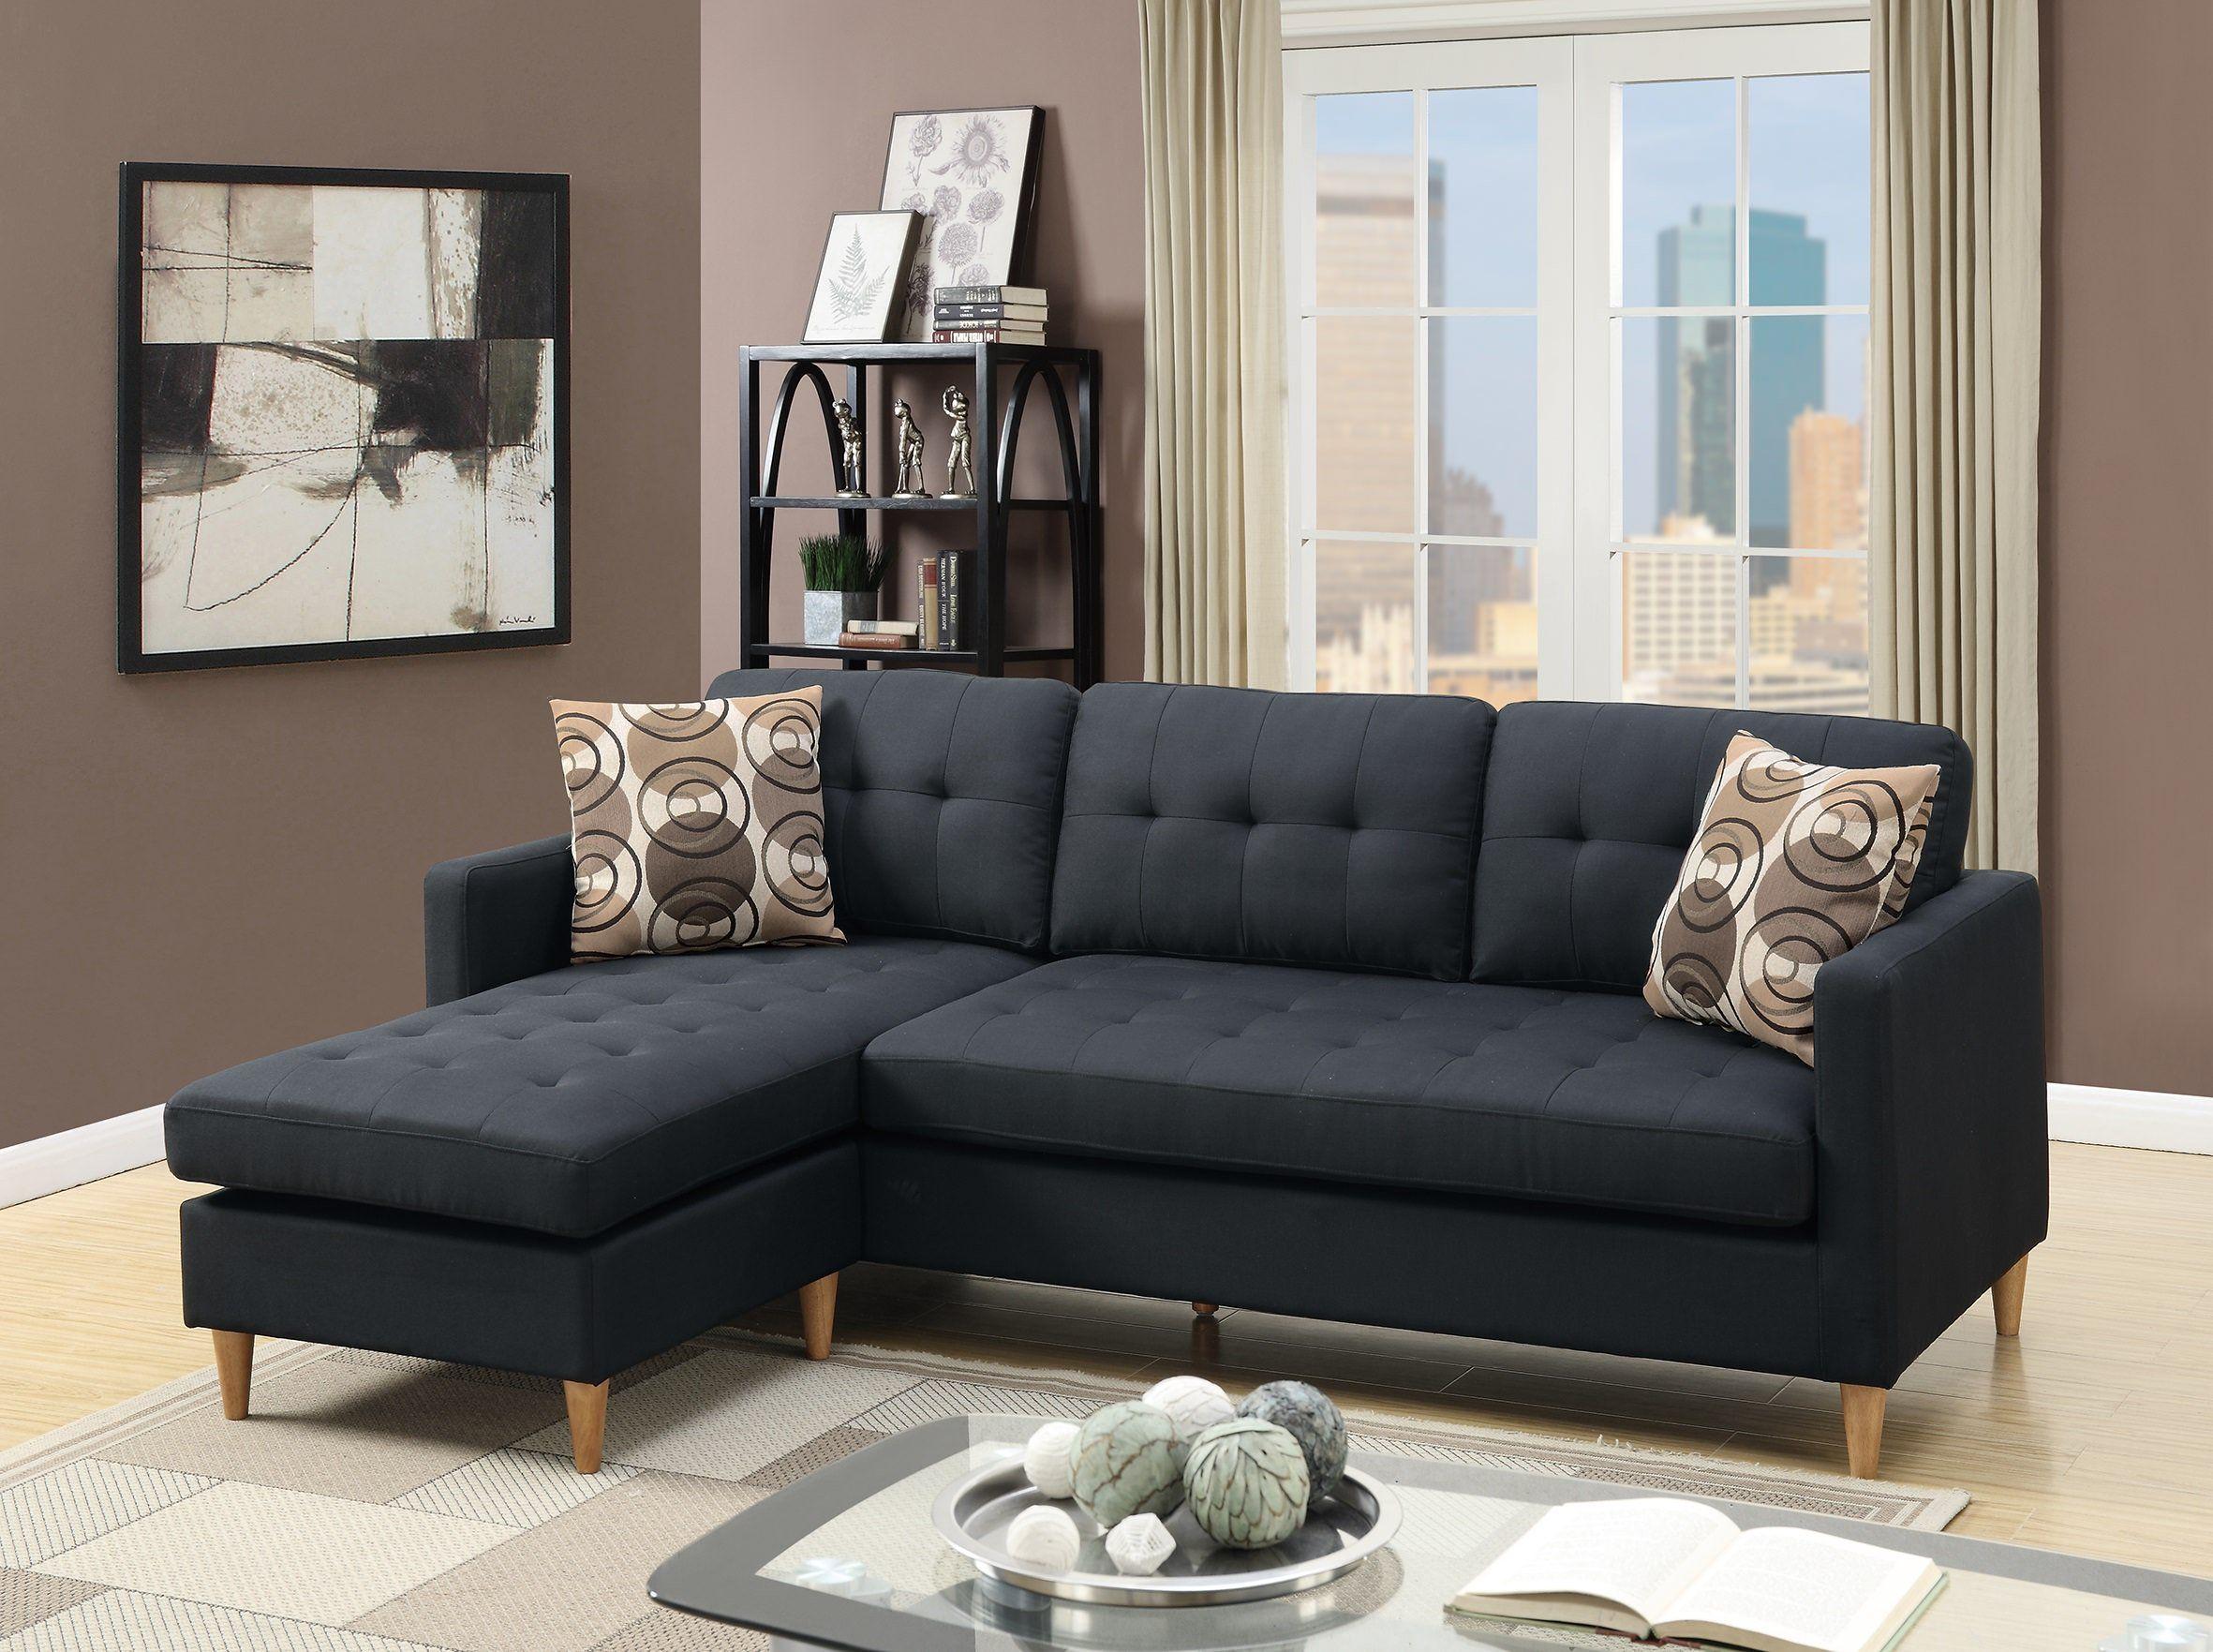 Poundex Bobkona F7084 Black Tufted Retro Sectional Sofa Chaise